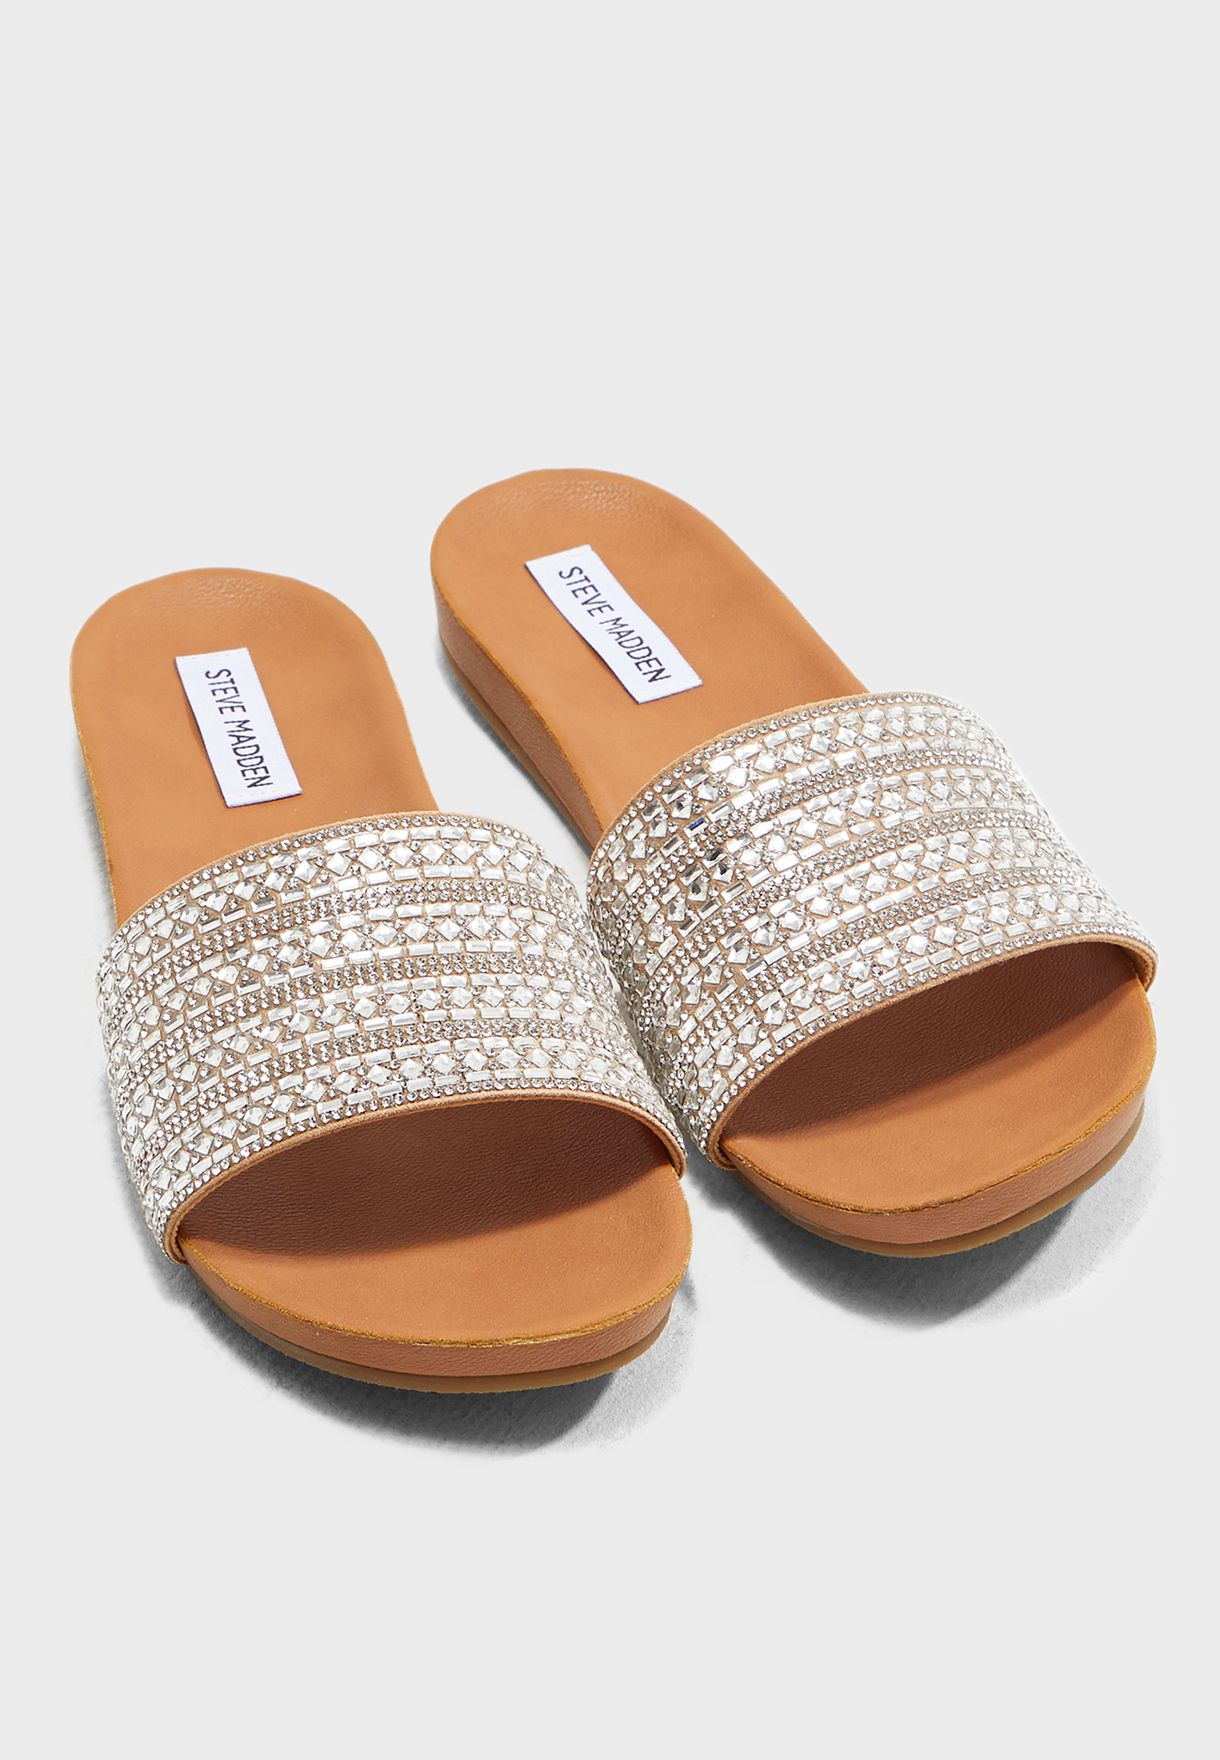 9162f2783 Shop Steve Madden silver Dazzle Flat Sandal - Stone DAZZLE for Women ...